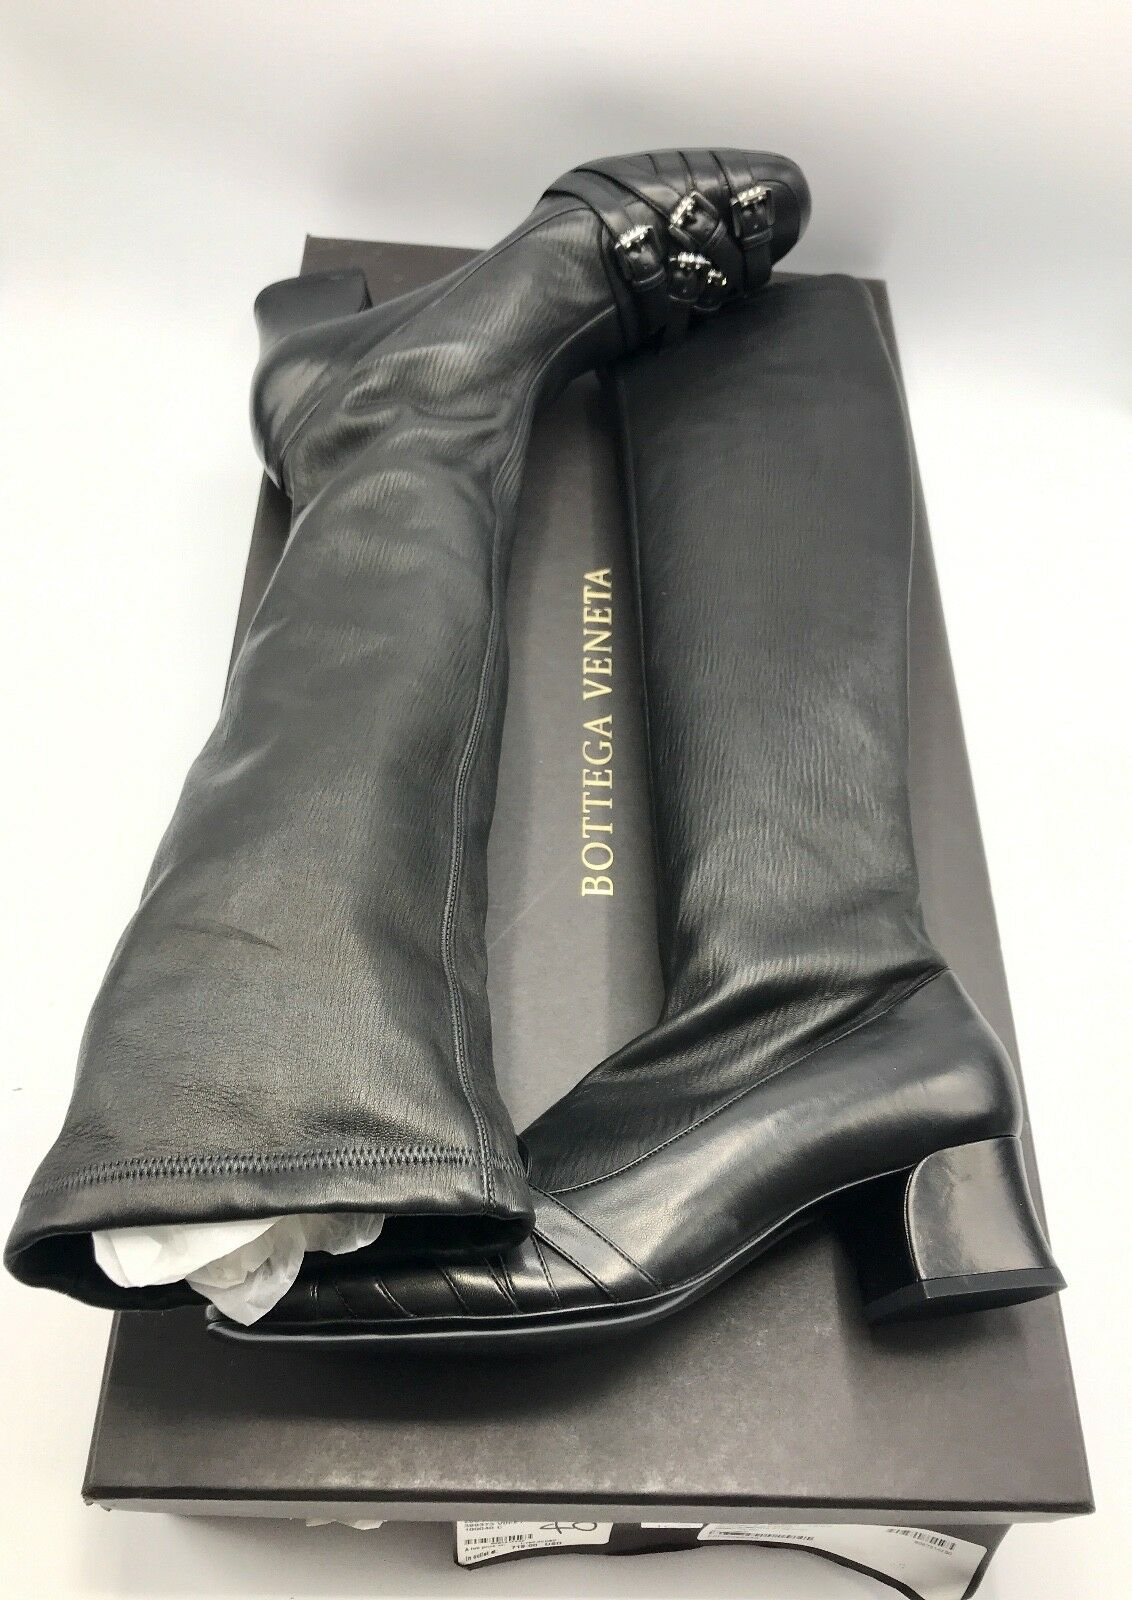 punti vendita NIB BOTTEGA VENETA VENETA VENETA Donna  nero Leather stivali scarpe NAPPA STRETCH Dimensione 40 US10  designer online